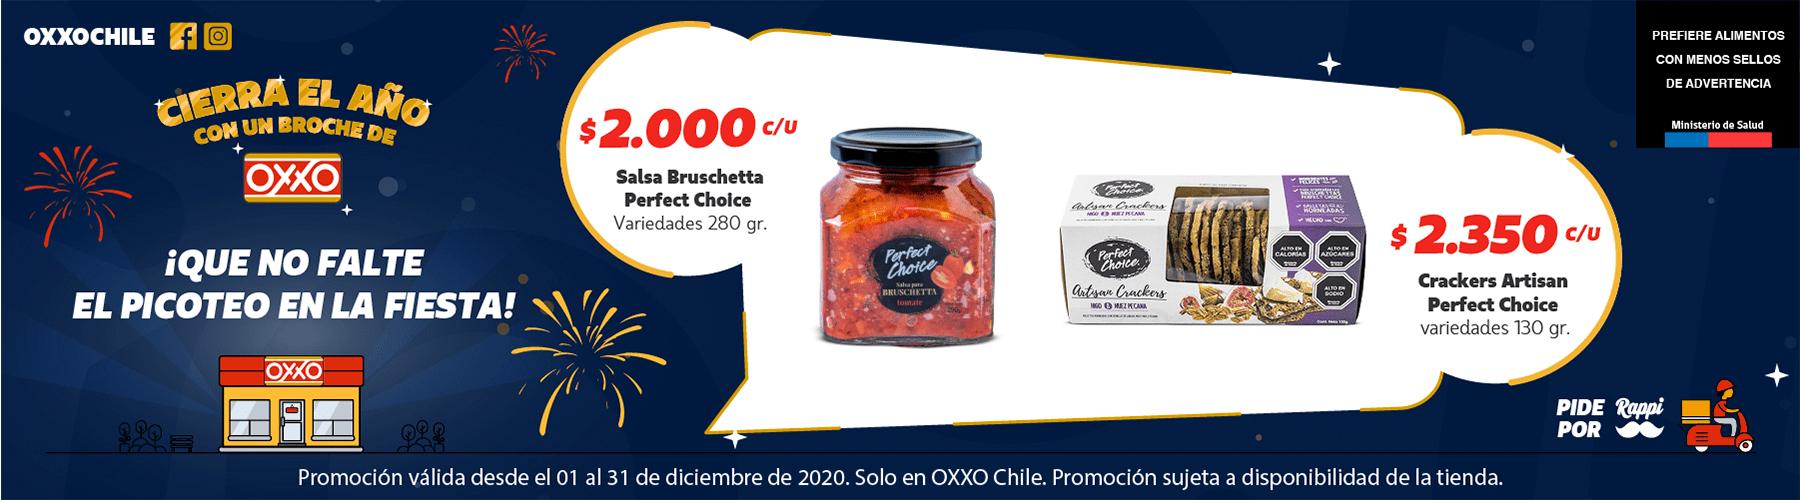 OXXO Chile Pizza P12 2020